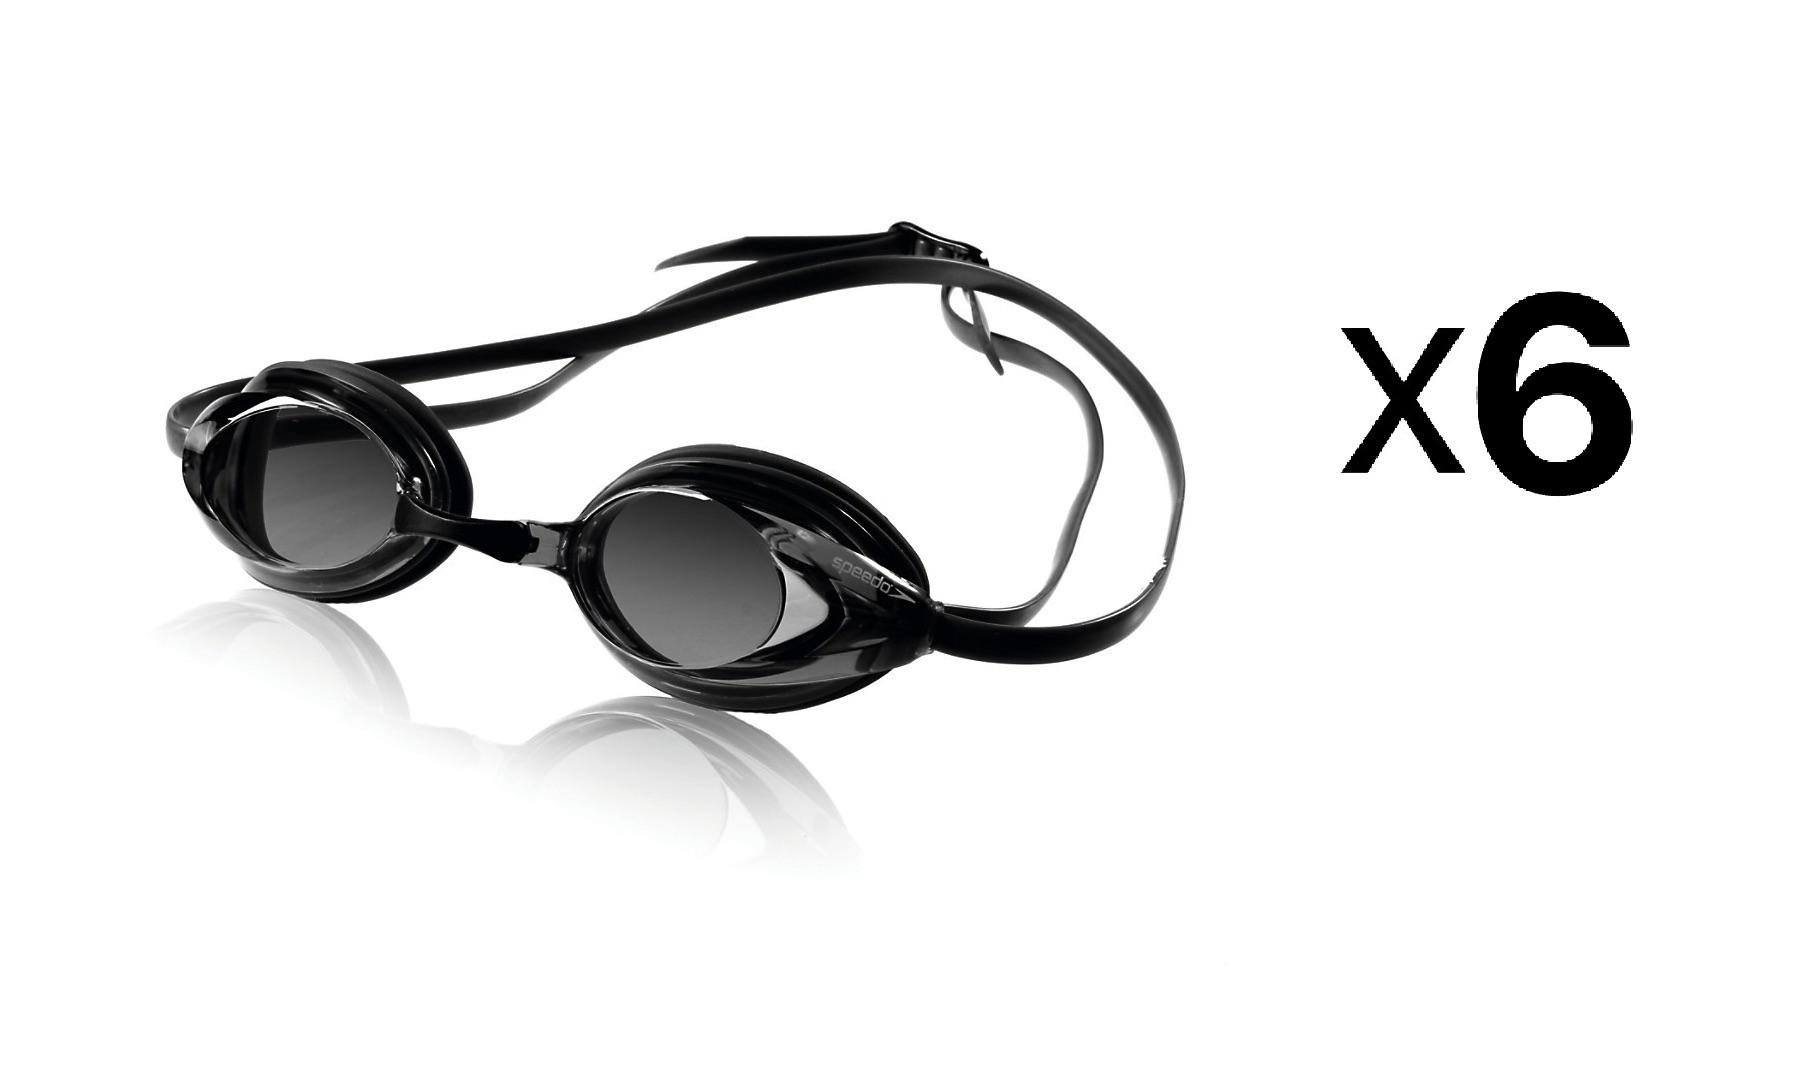 585a640bac65 Speedo Vanquisher Optical Swim Swimming Goggles Smoke Diopter -2.0 ...